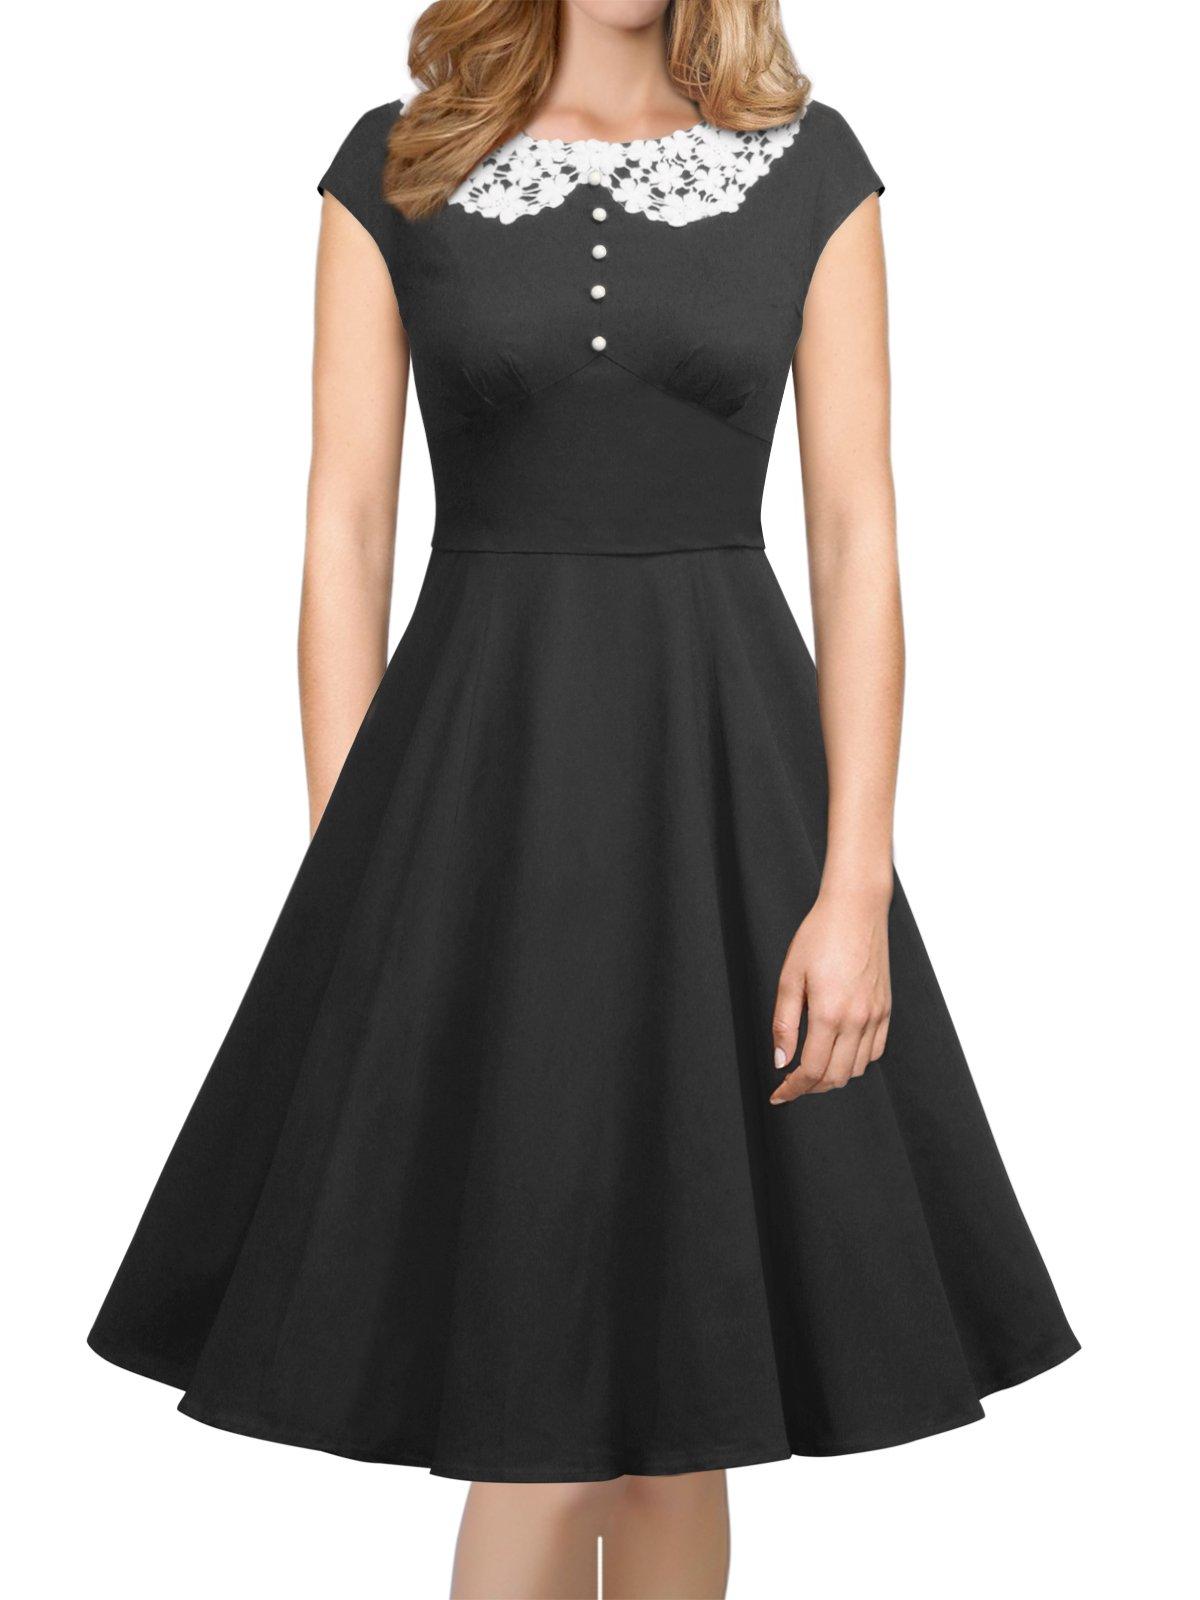 iLover Womens Classy Vintage Audrey Hepburn Style 1940's Rockabilly Evening Dress,Black,X-Large